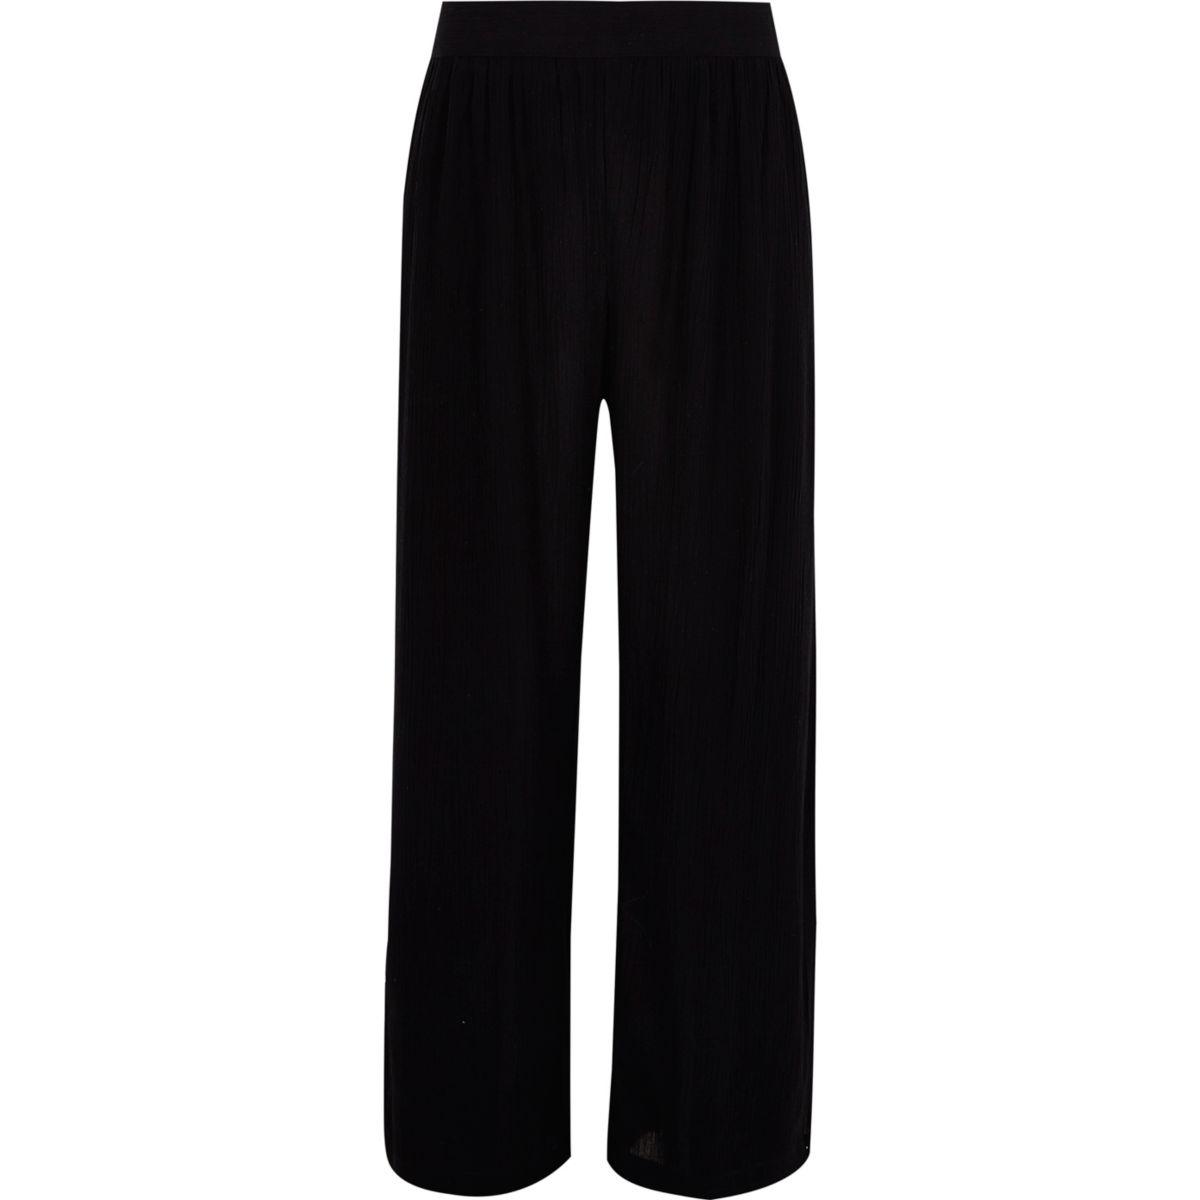 Girls black palazzo wrap pants